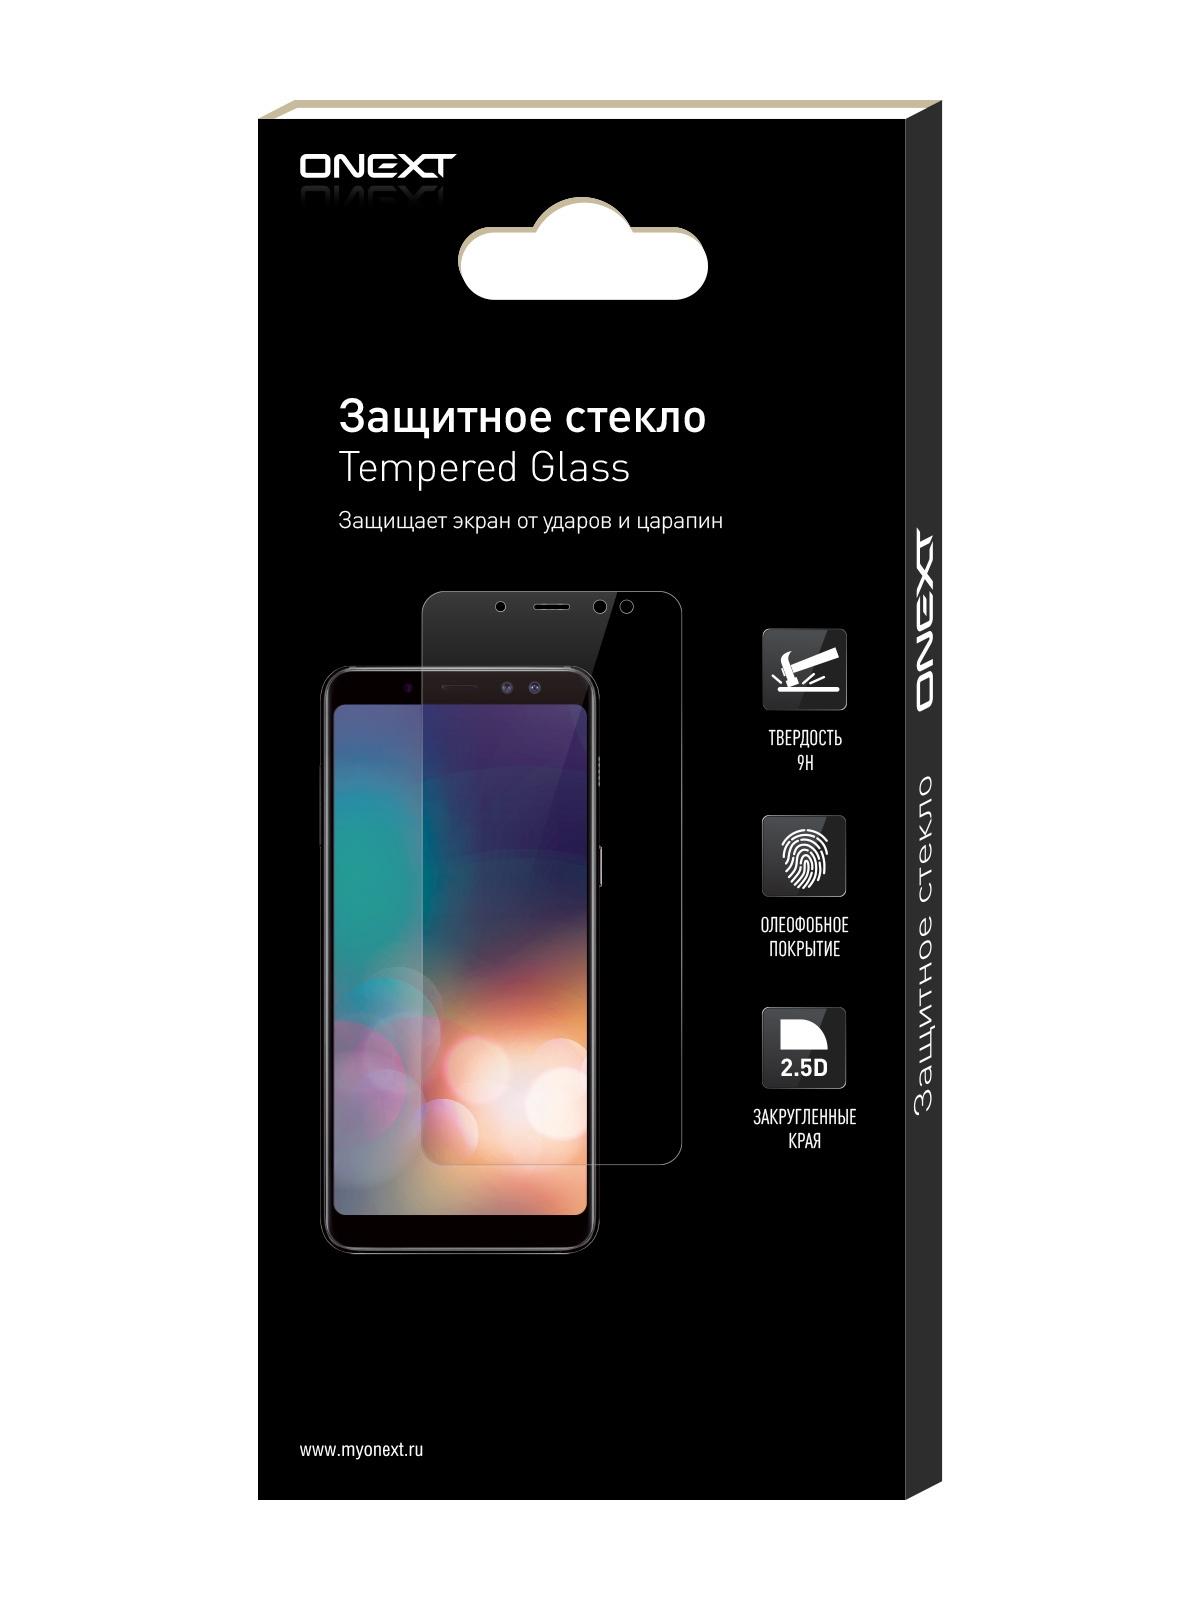 Защитное стекло ONEXT Asus Zenfone 4 Max ZC520KL недорого